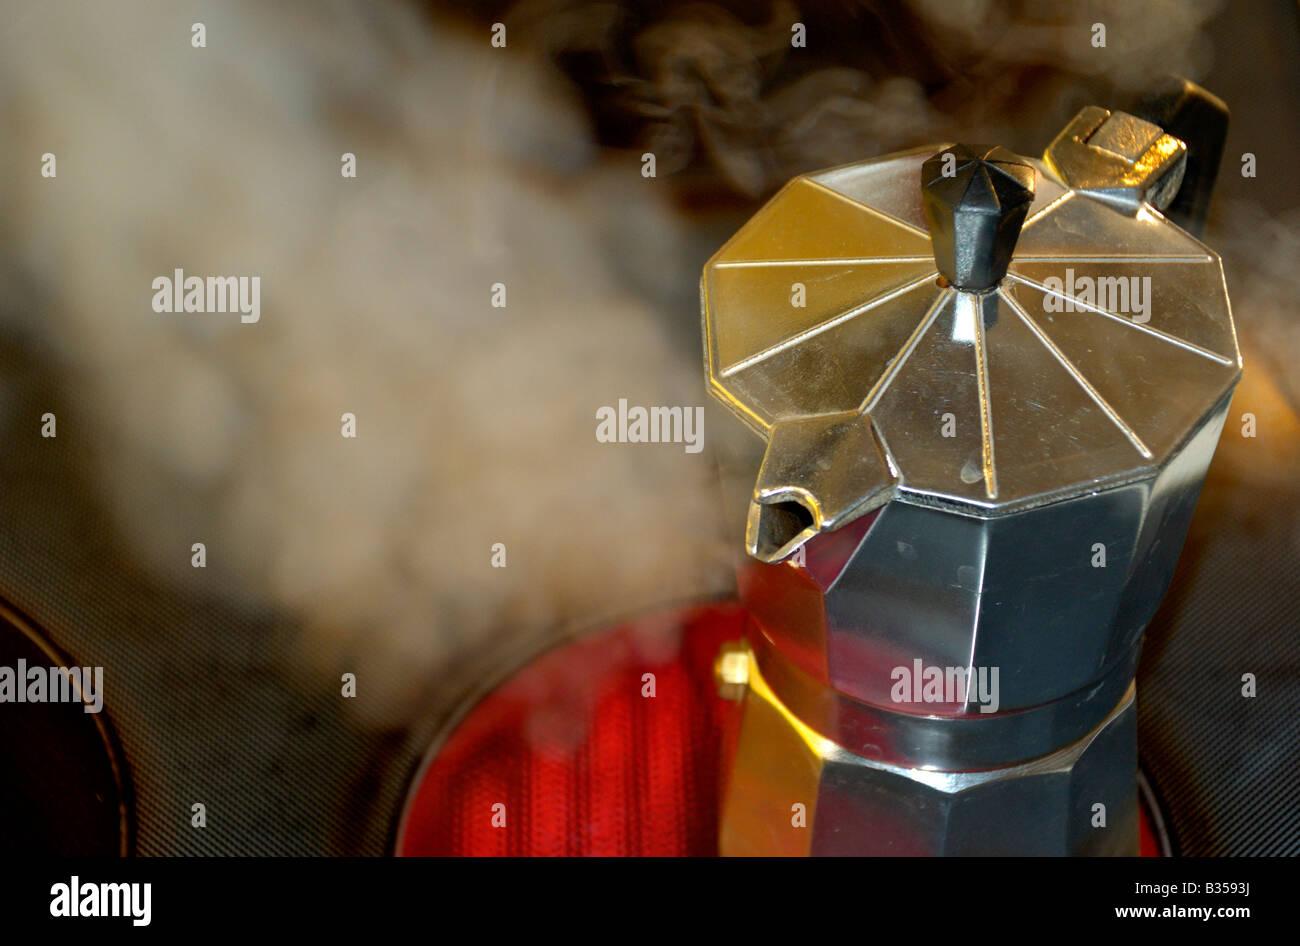 Stovetop moka espresso maker producing steam - Stock Image